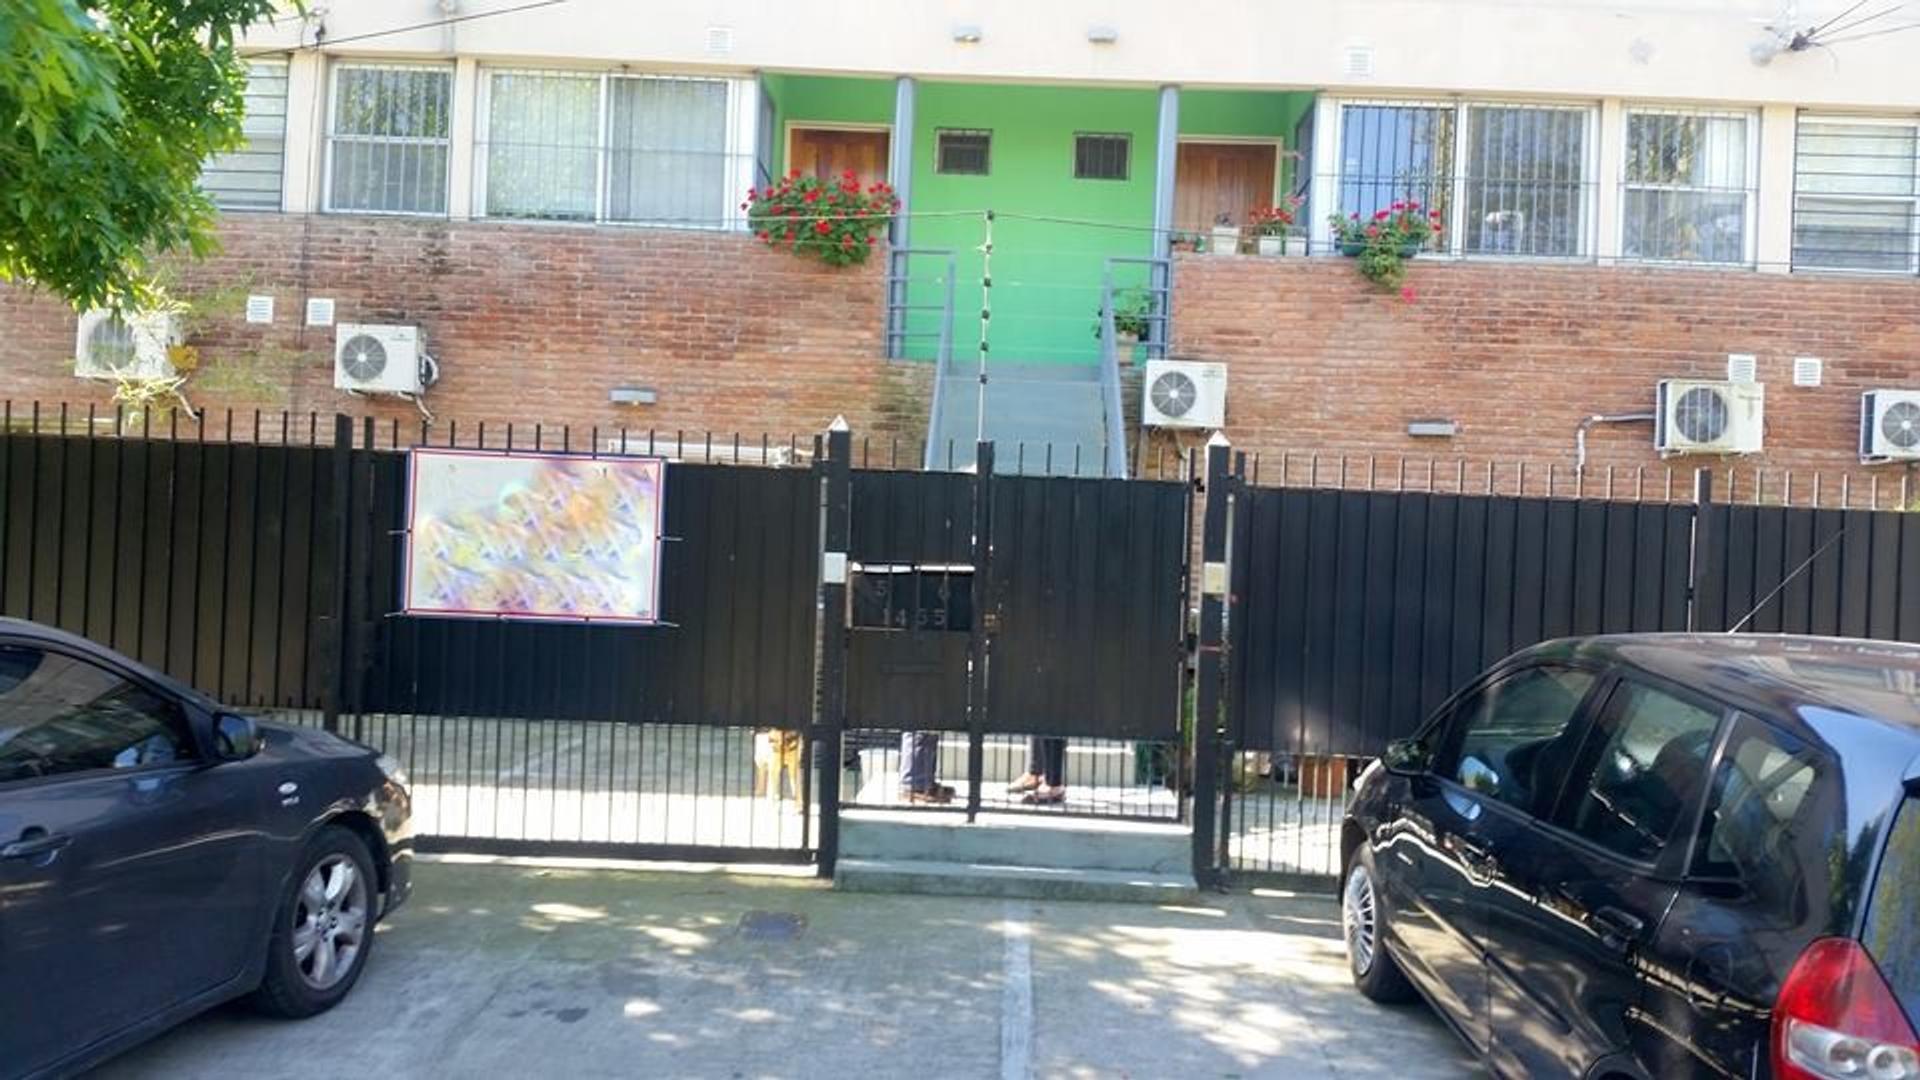 Tigre Condominio Bolo Bolaños 1400. 200 m2. 4 dormitorios. 2 suites Super vista. Pileta. Sum. Parque